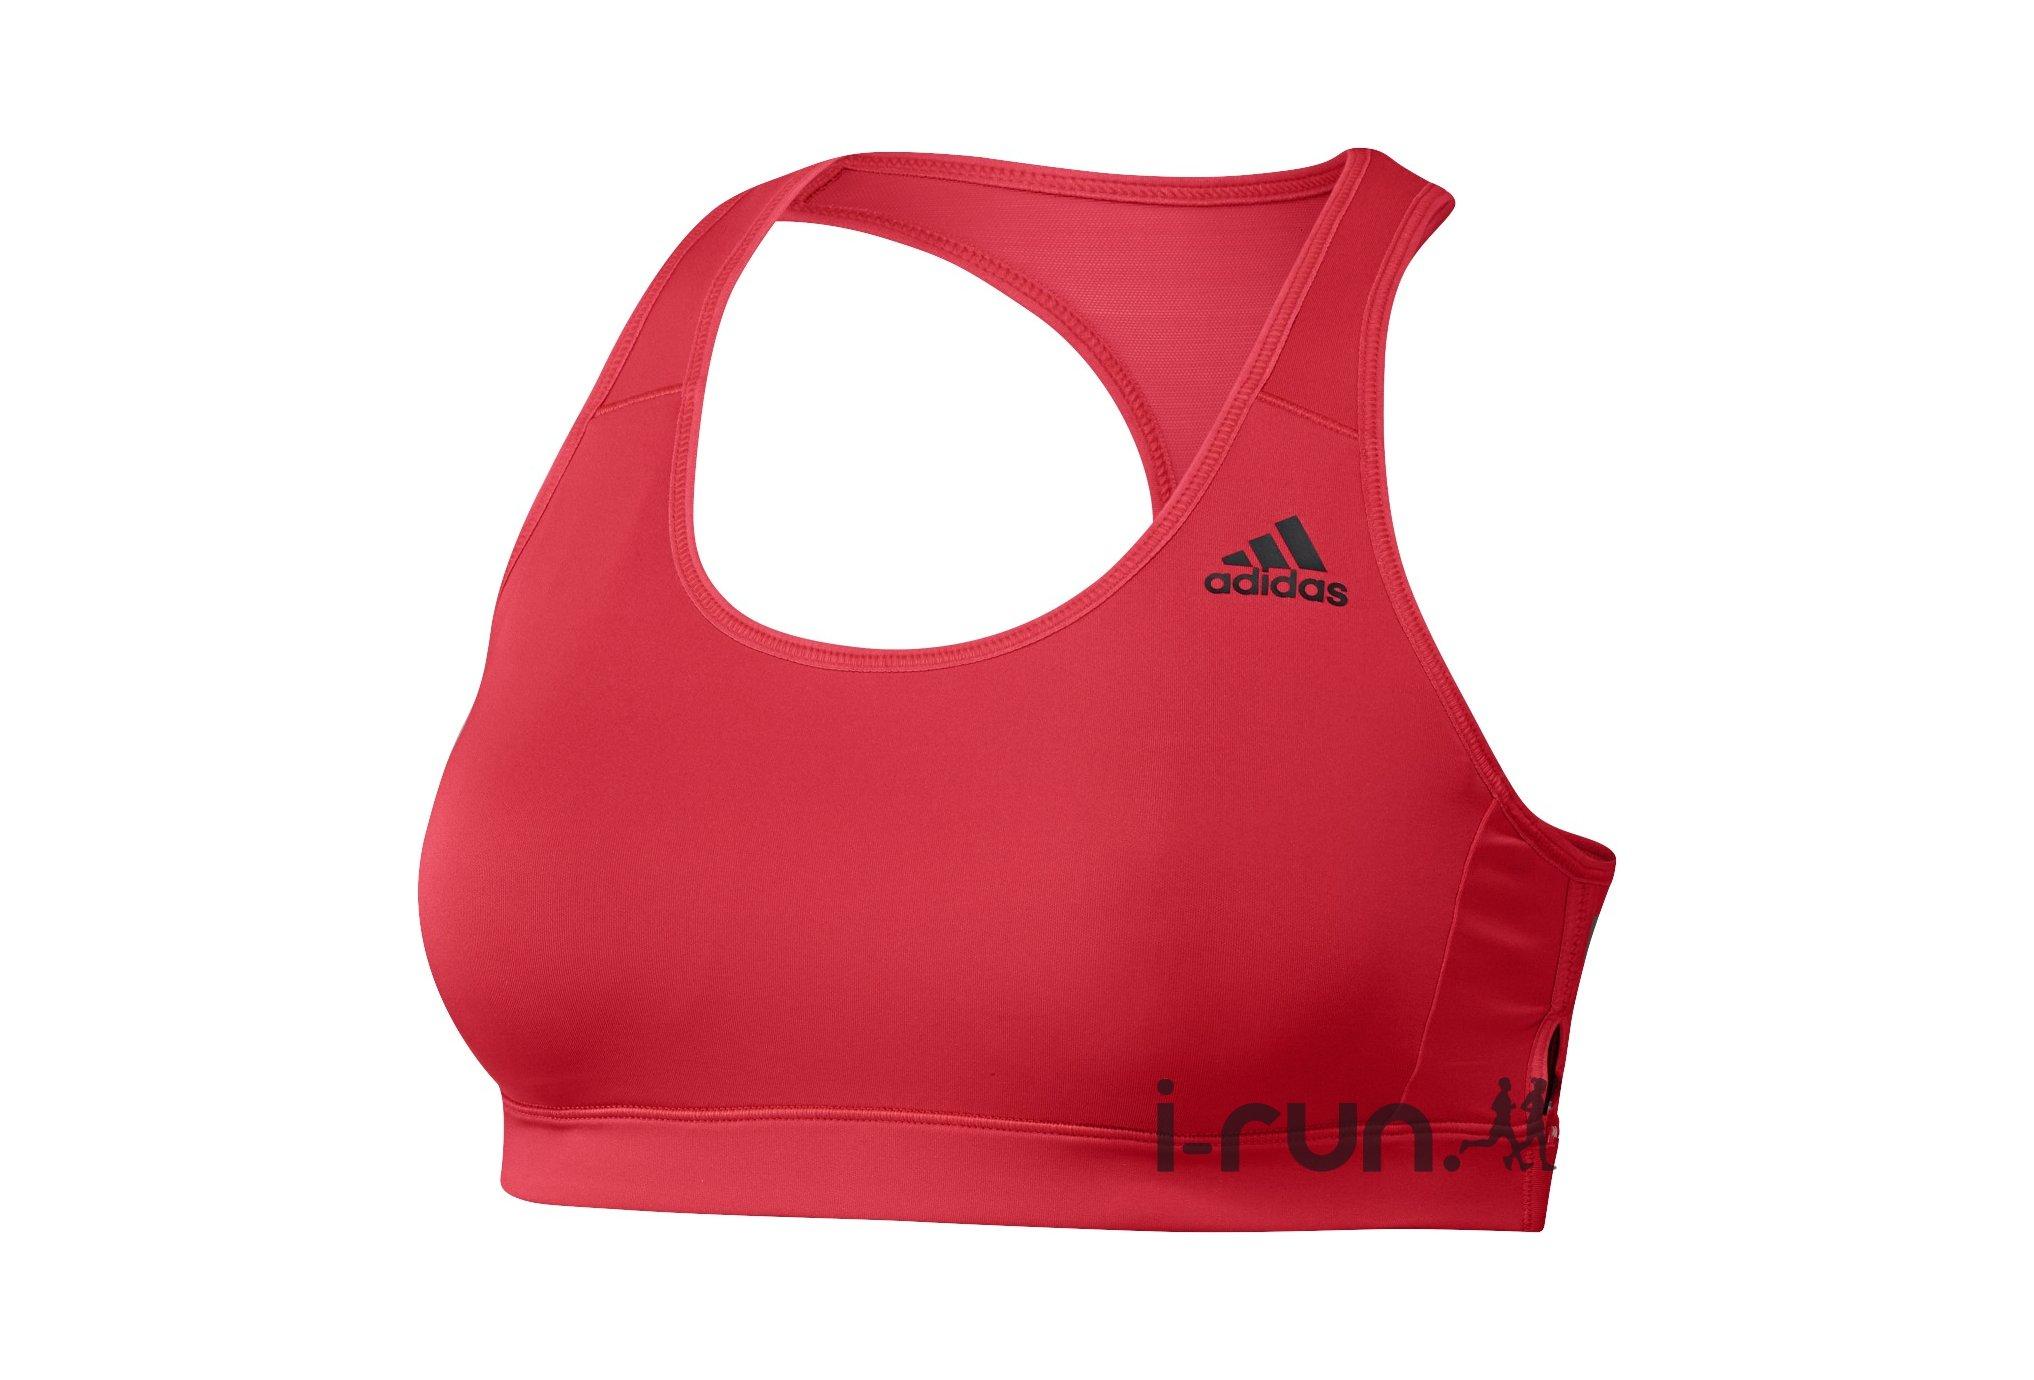 Adidas bassière racer back 3 stripes vêtement running femme